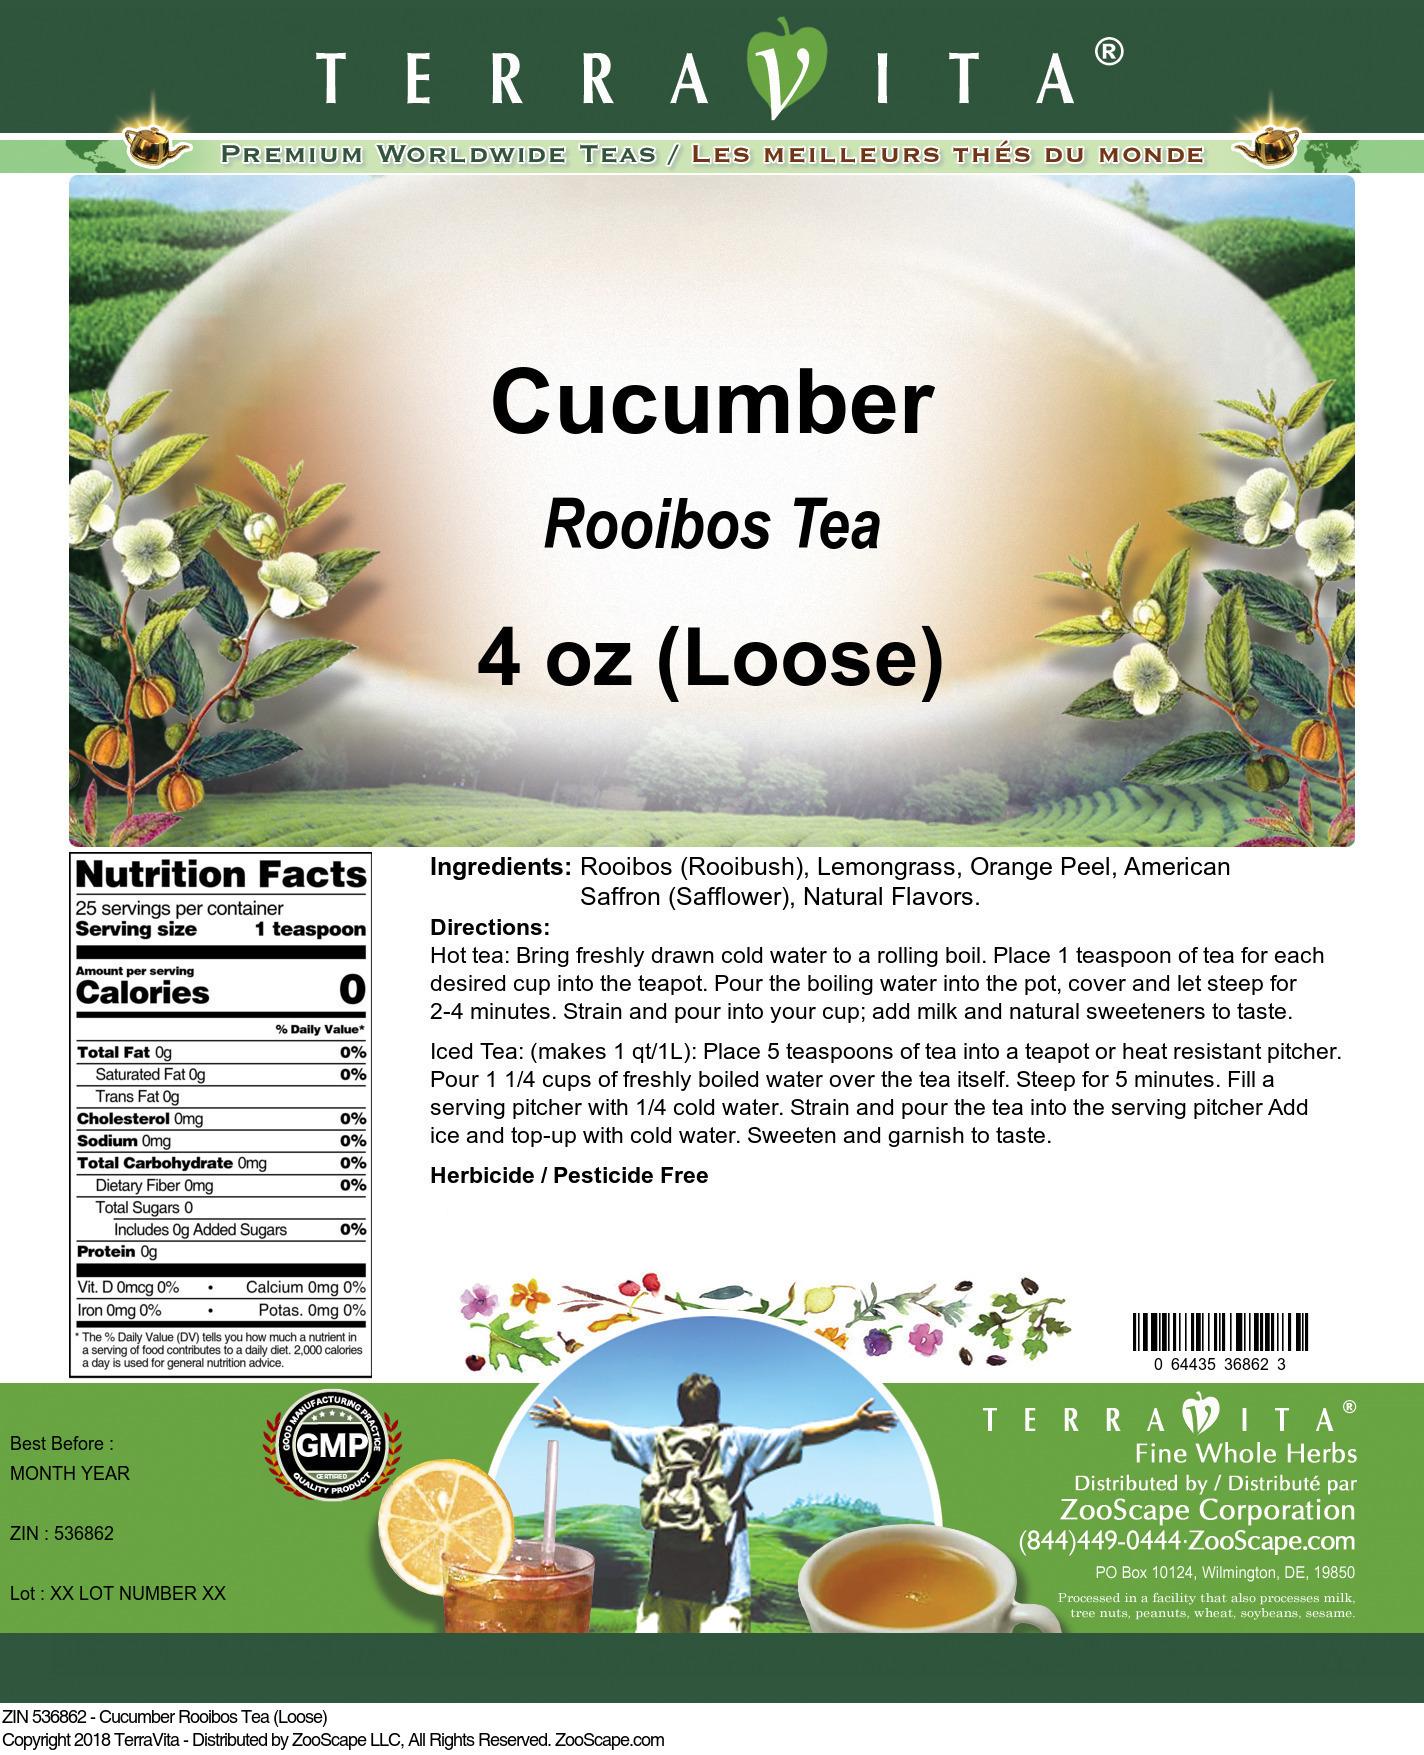 Cucumber Rooibos Tea (Loose)